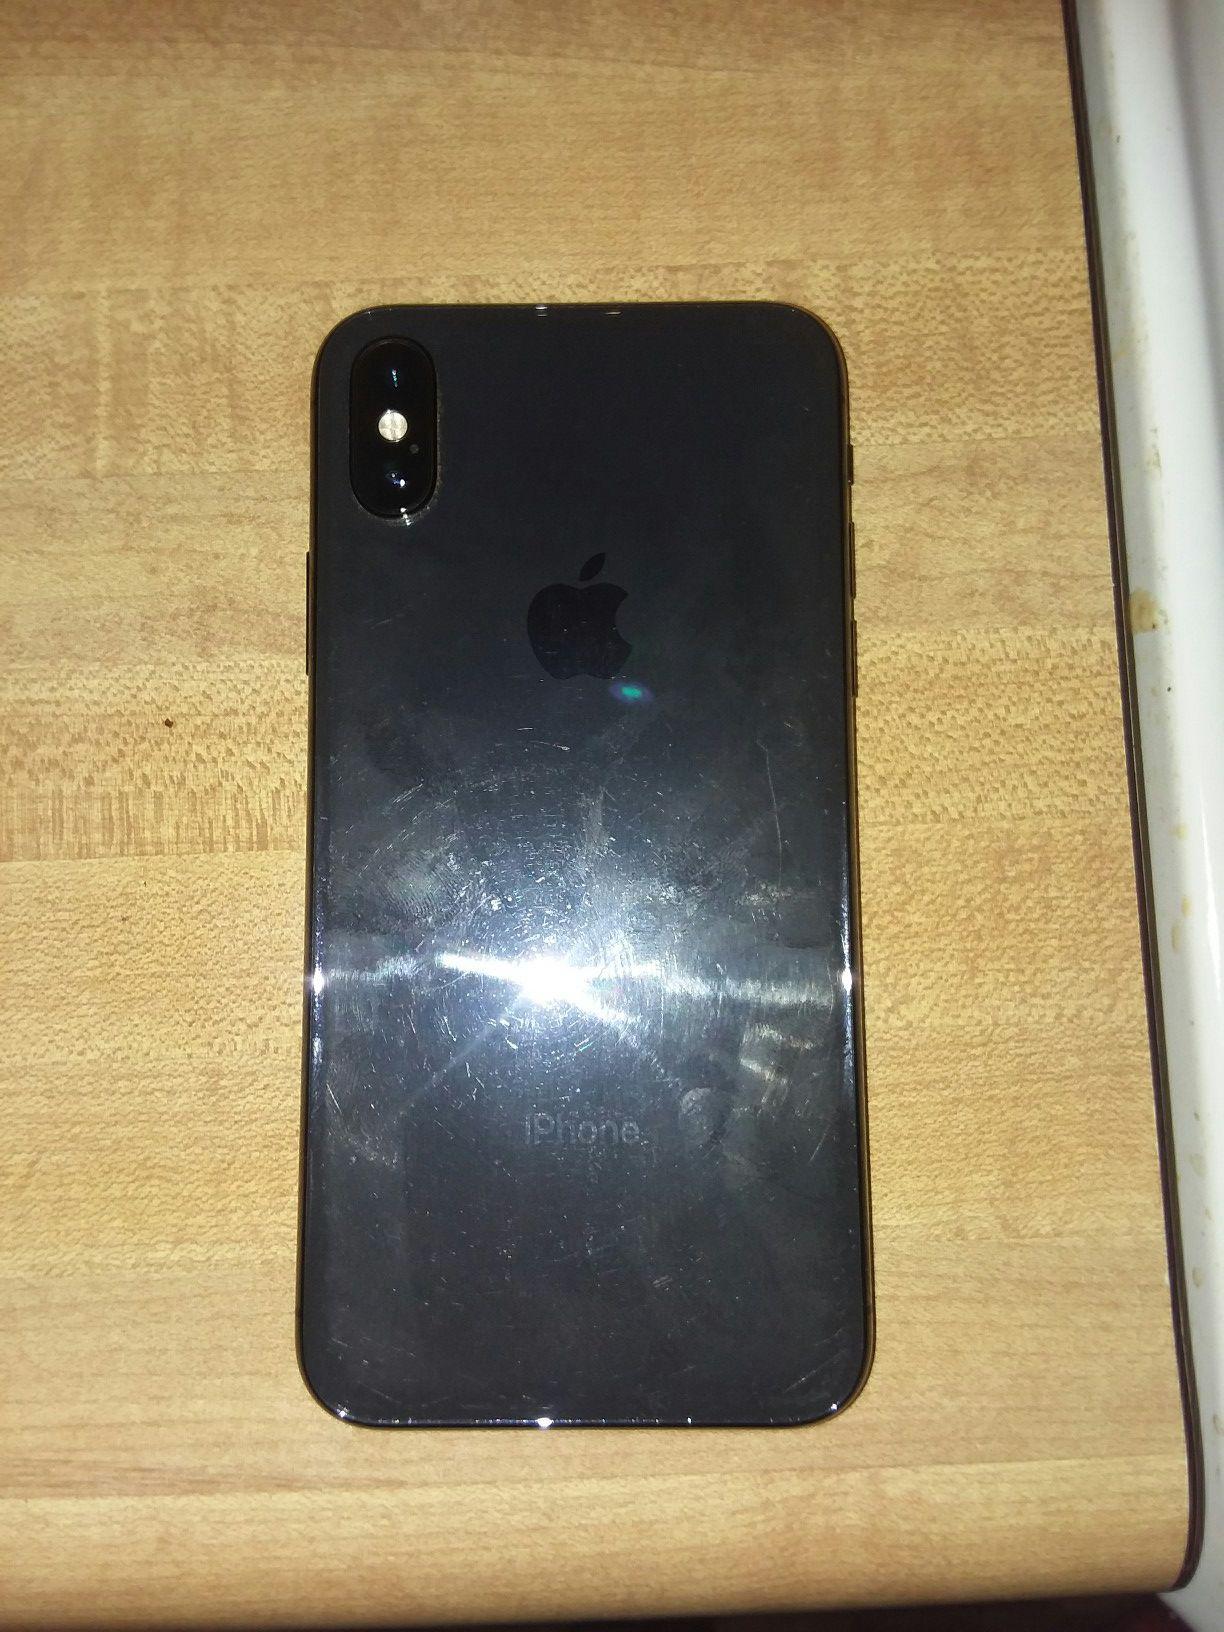 Iphone X, 256 gigs